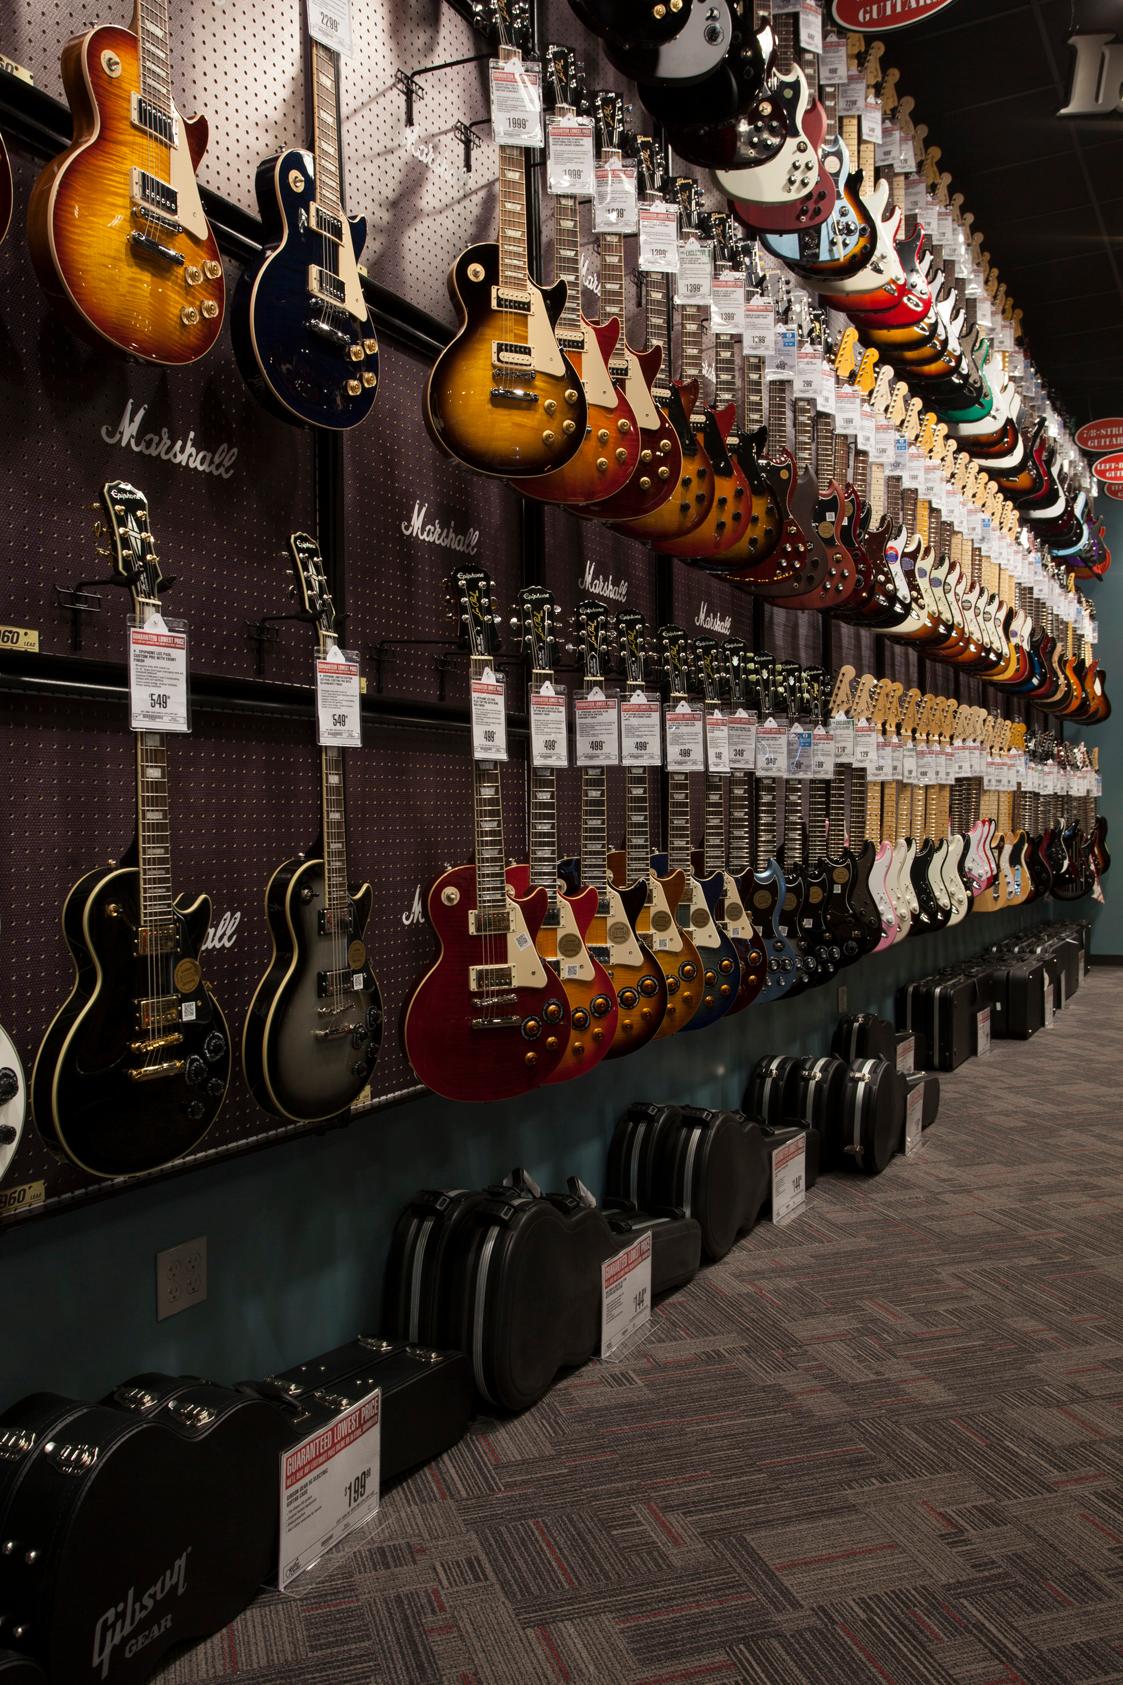 guitar center 2323 nj-66 ocean, nj music stores-vintage - mapquest